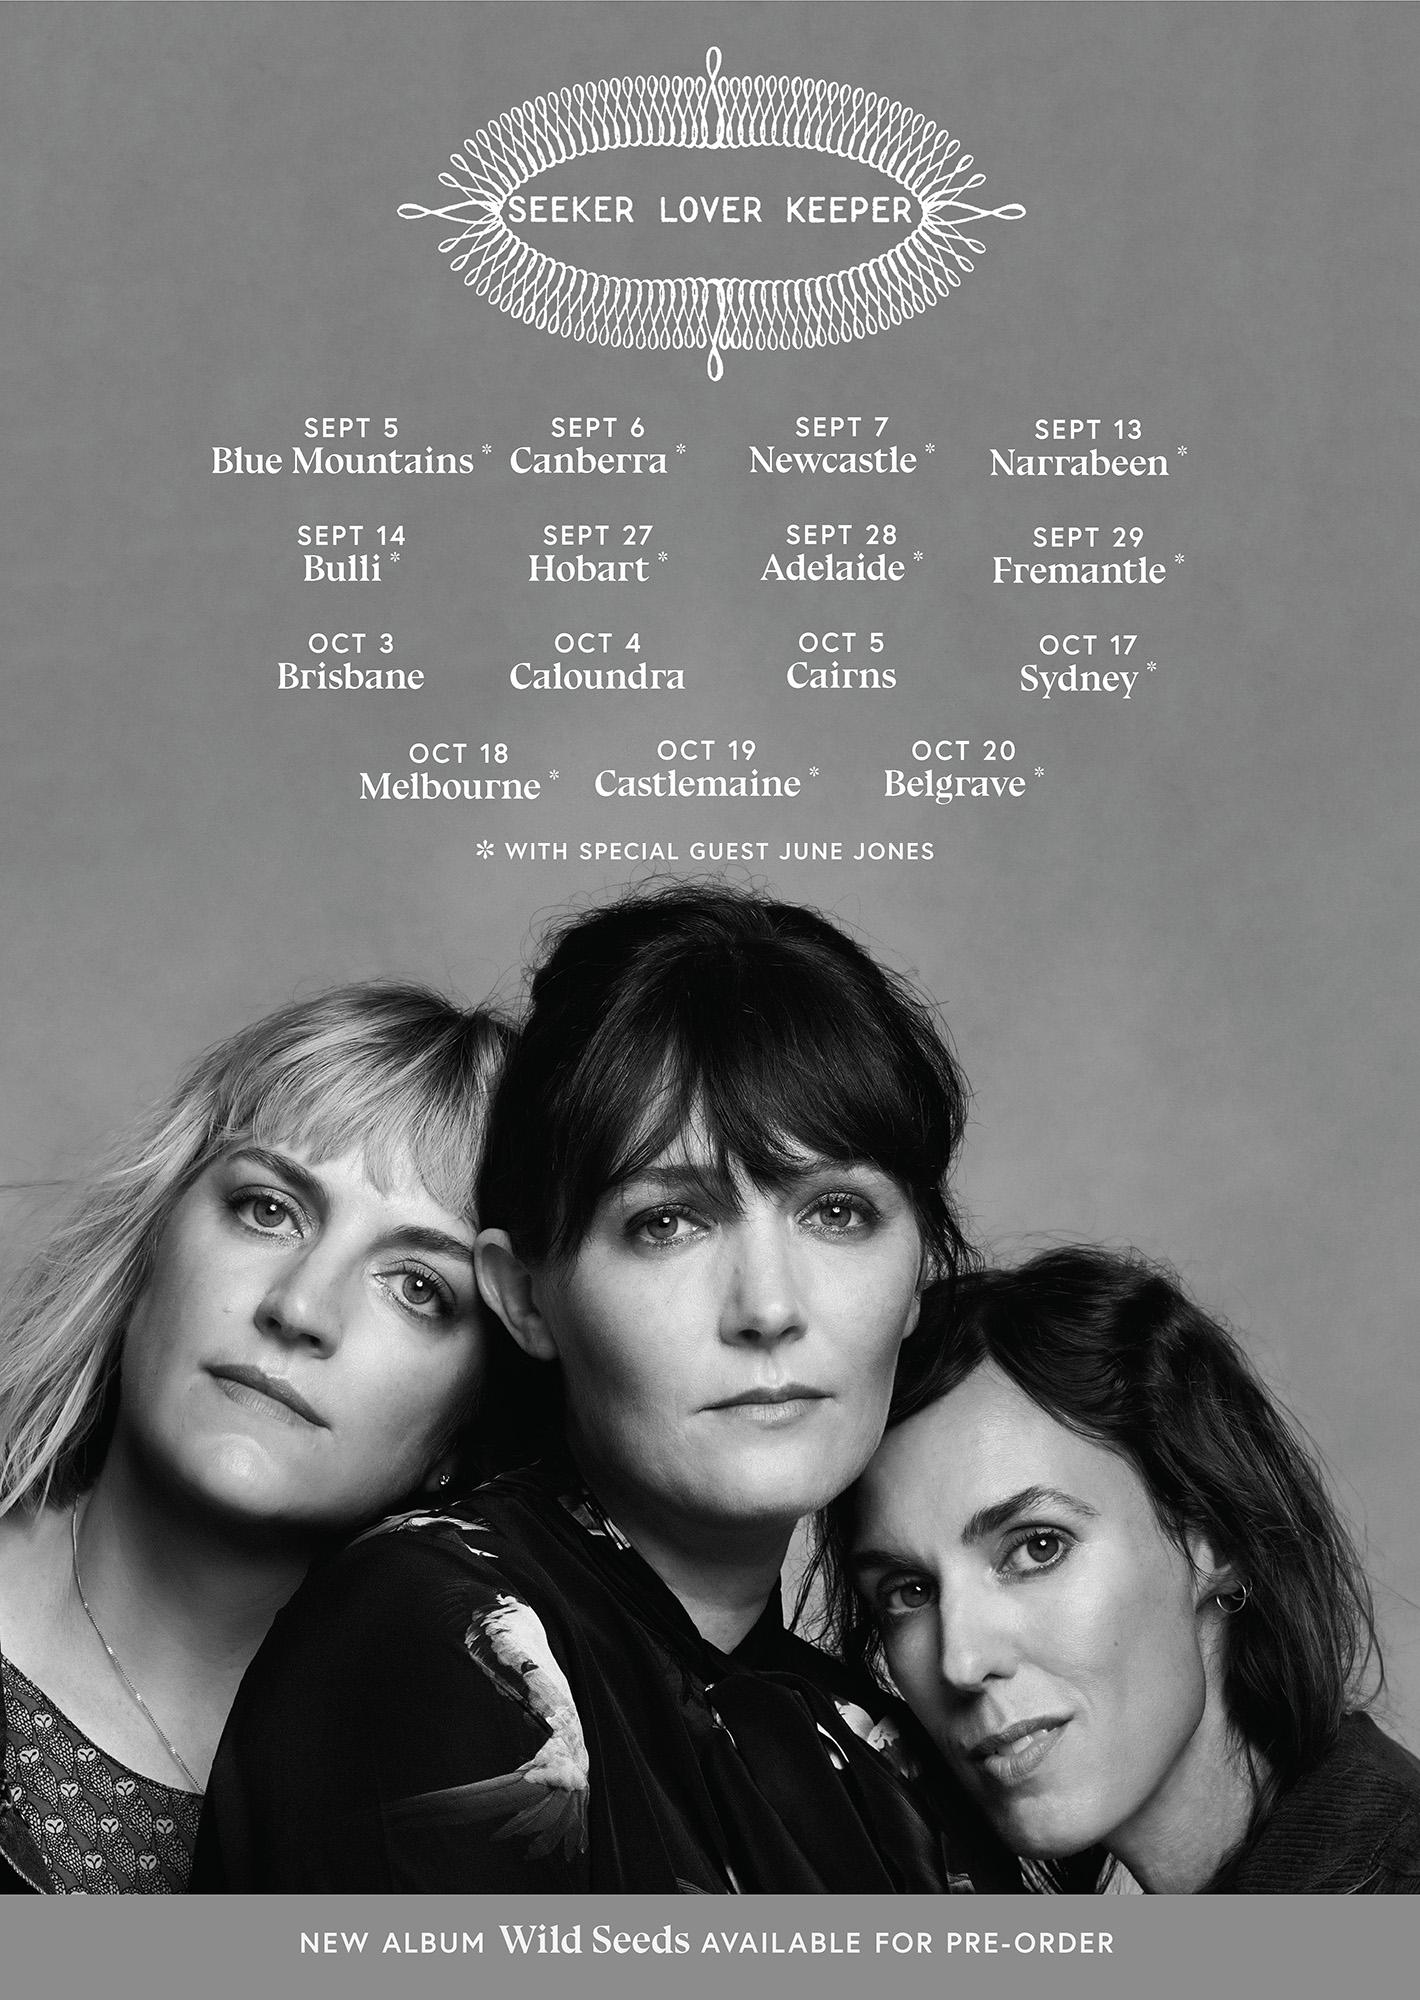 Seeker Lover Keeper - AusTour-2019-ALL-Poster-Web.jpg